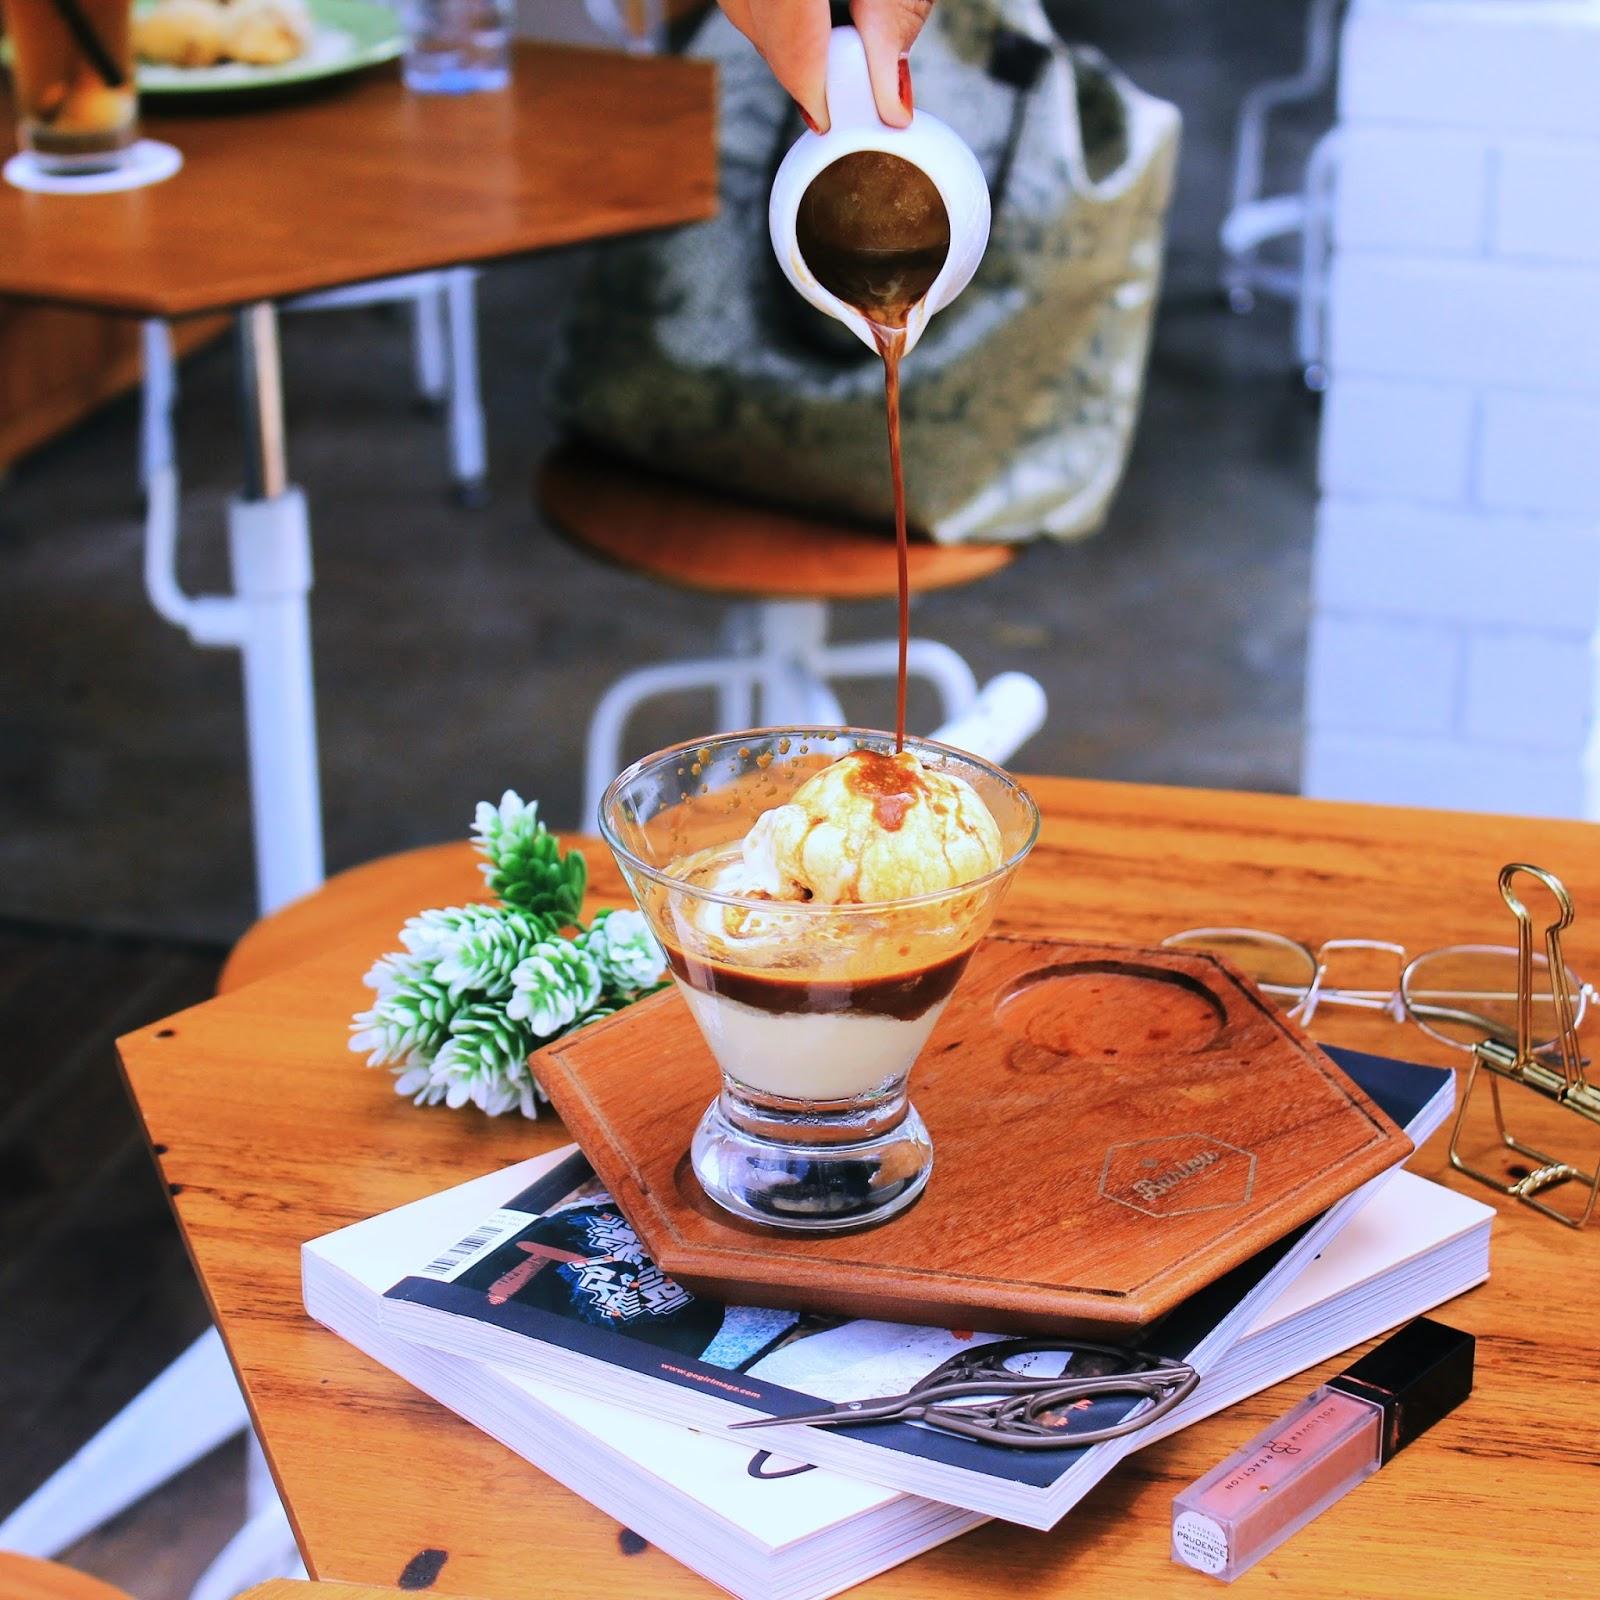 BARLEU COFFEE SHOP, BANDUNG